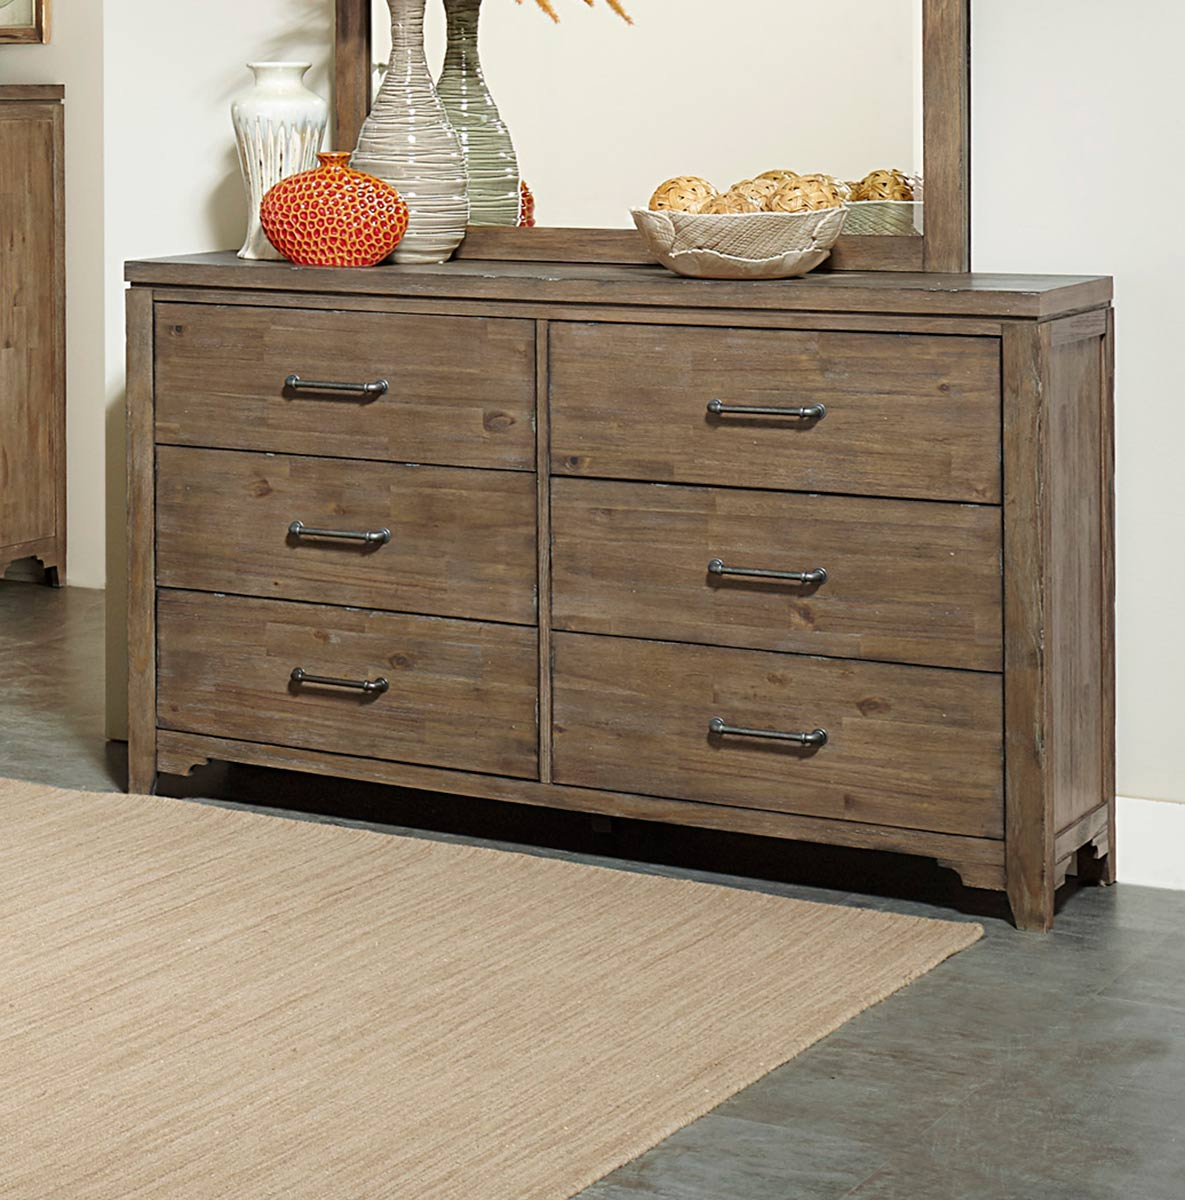 Homelegance Lyer Dresser - Rustic Brown